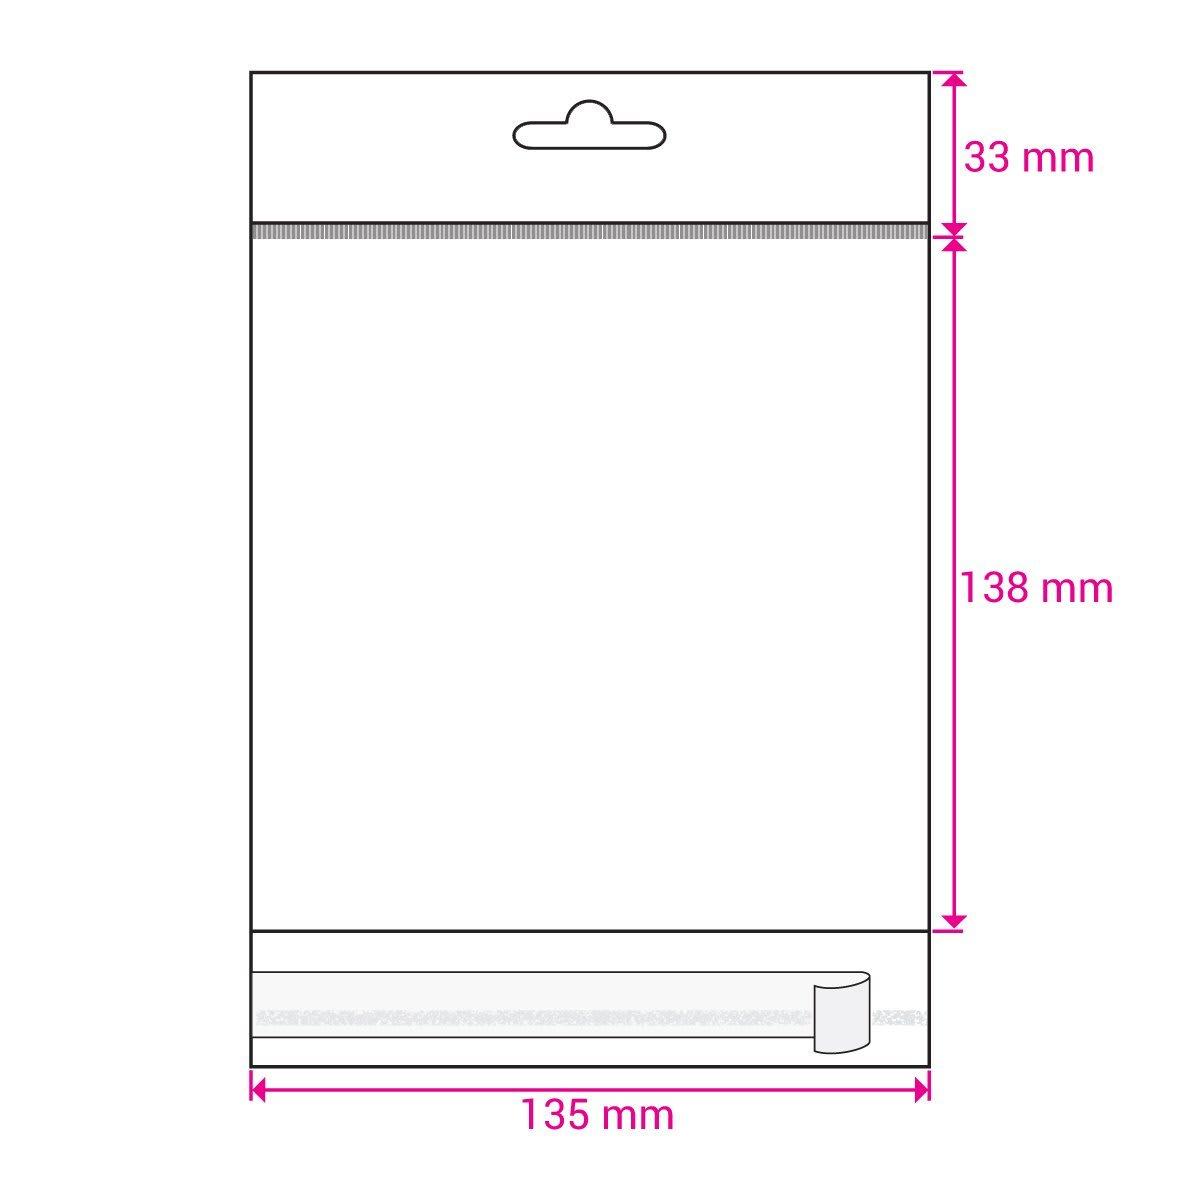 EURO SLOT HEADER BAGS size: 135 x 138 mm. Plus (SELF ADHESIVE)